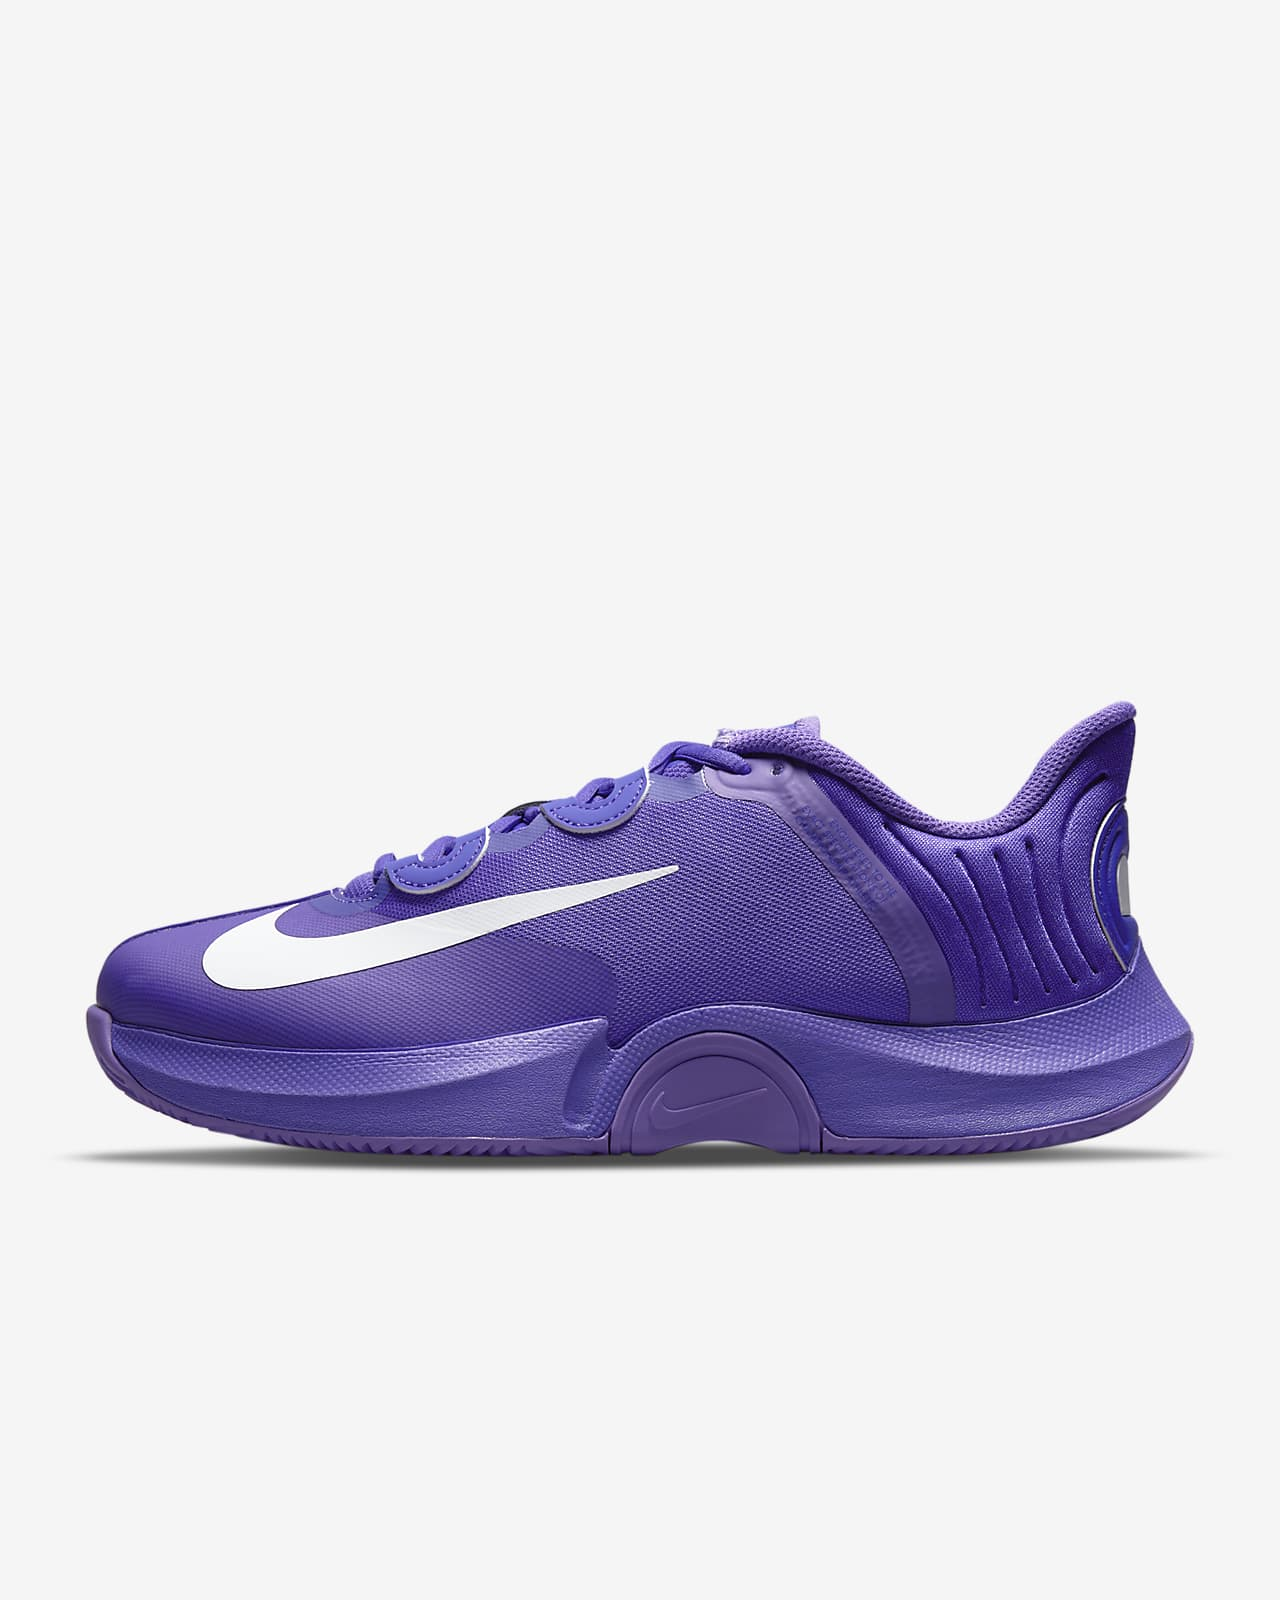 Chaussure de tennis pour terre battue NikeCourt Air Zoom GP Turbo Naomi Osaka pour Femme